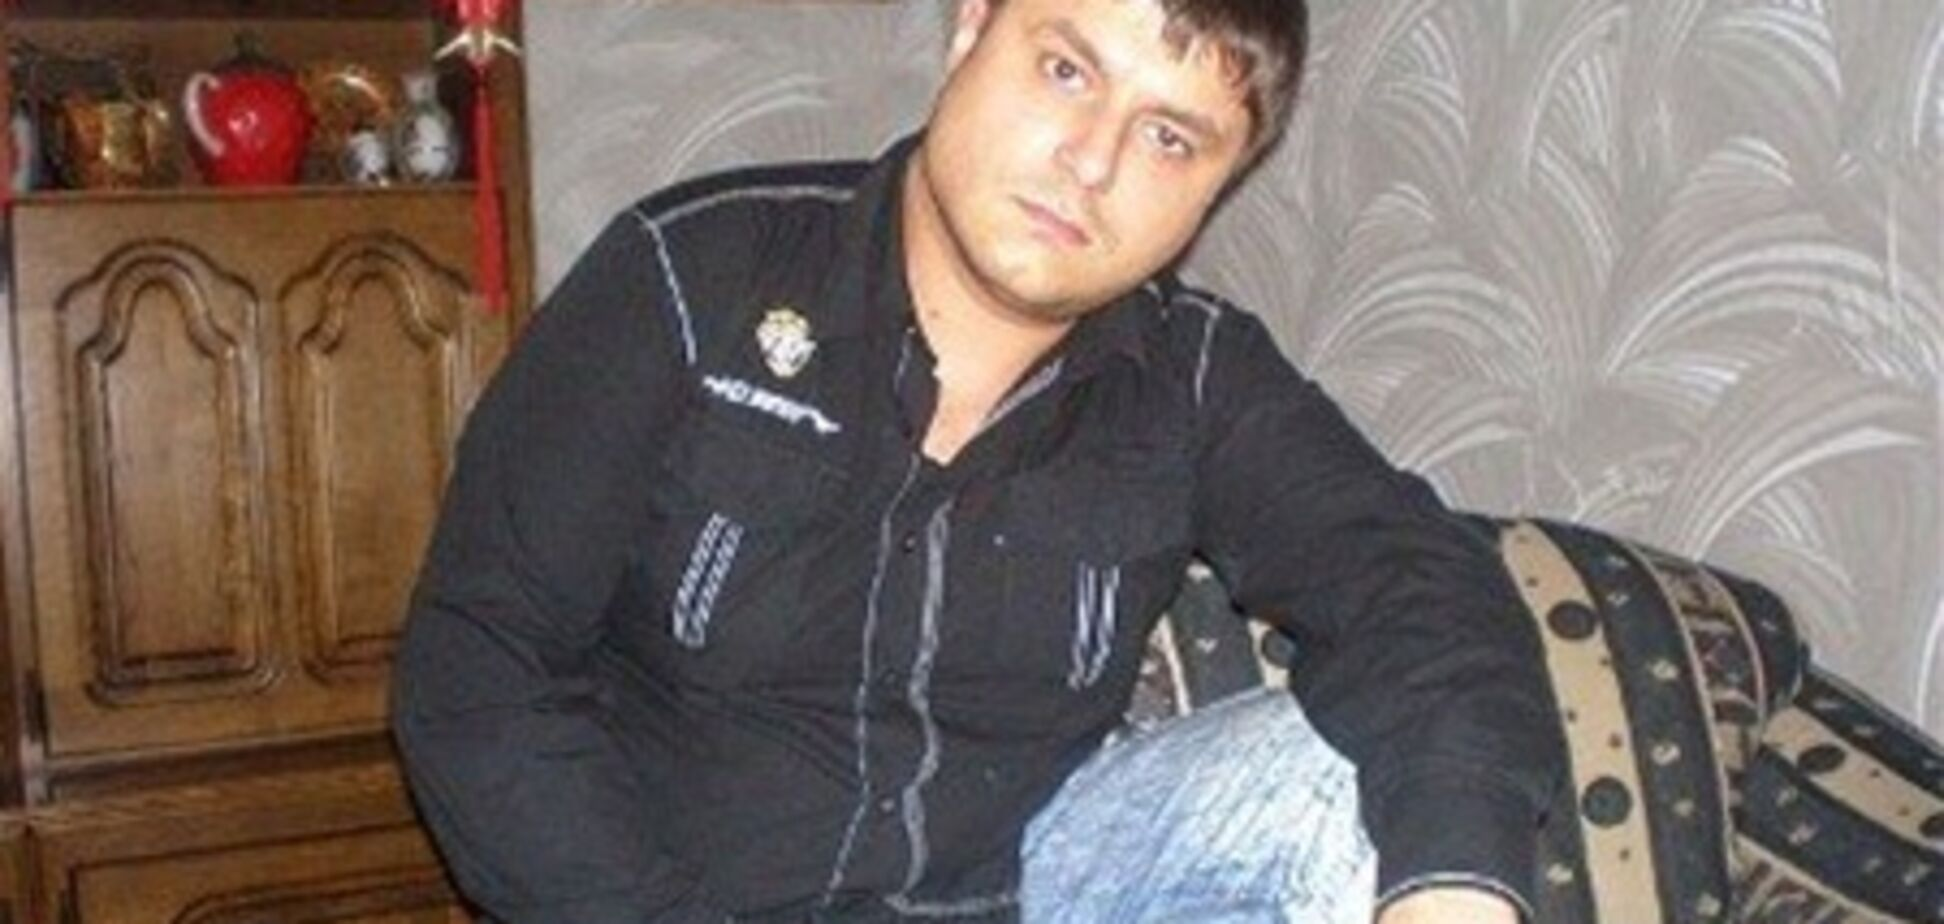 Девушку на луганской елке задавил 'Дядя Жора' (ФОТО)